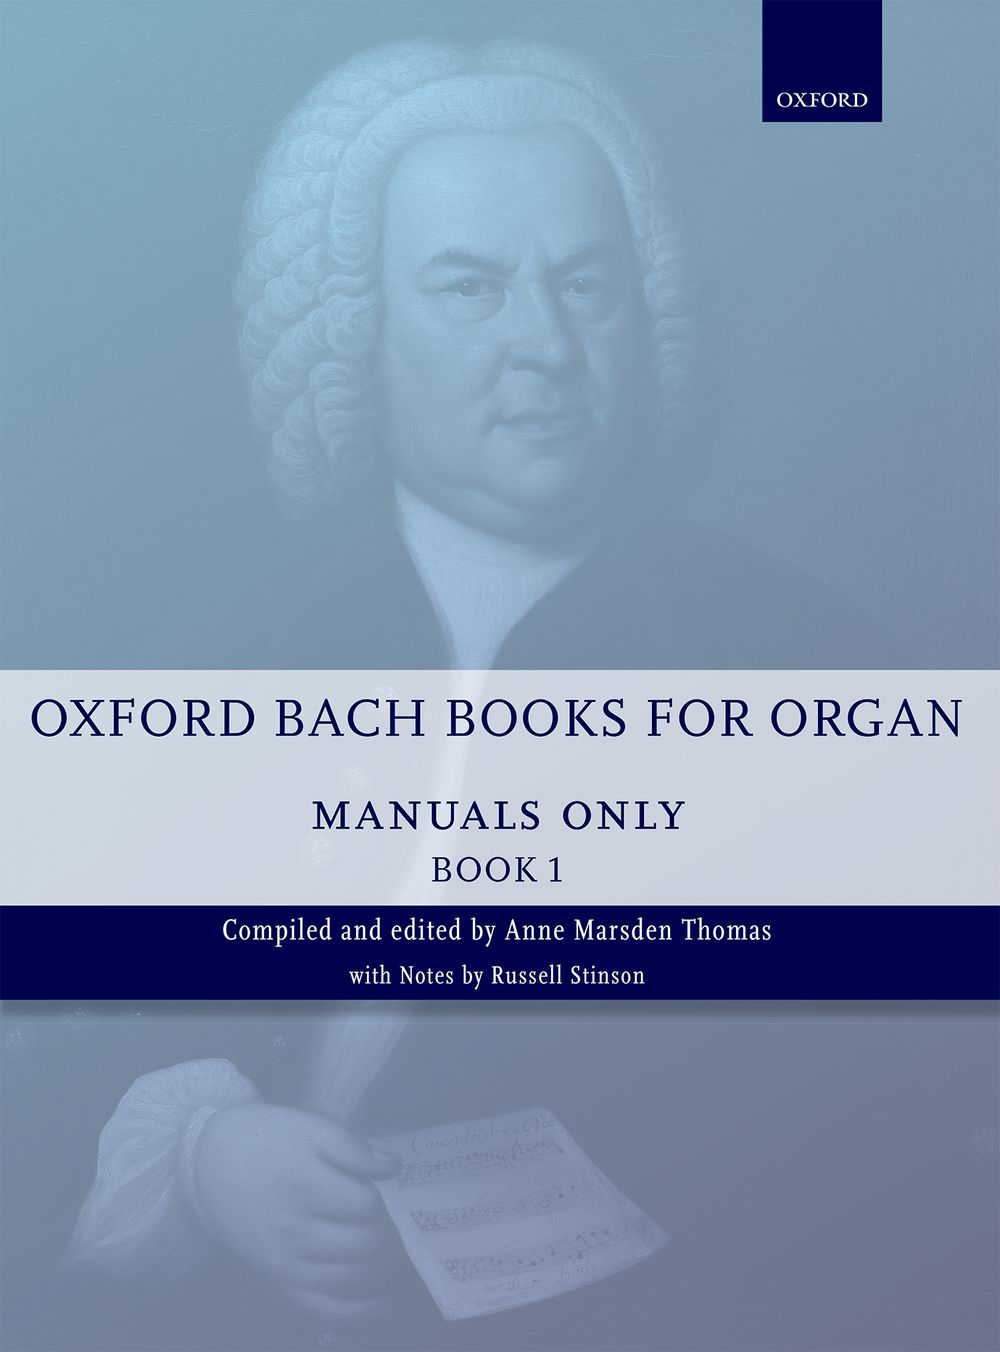 Johann Sebastian Bach: Oxford Bach Books for Organ: Manuals Only  Book 1: Organ: